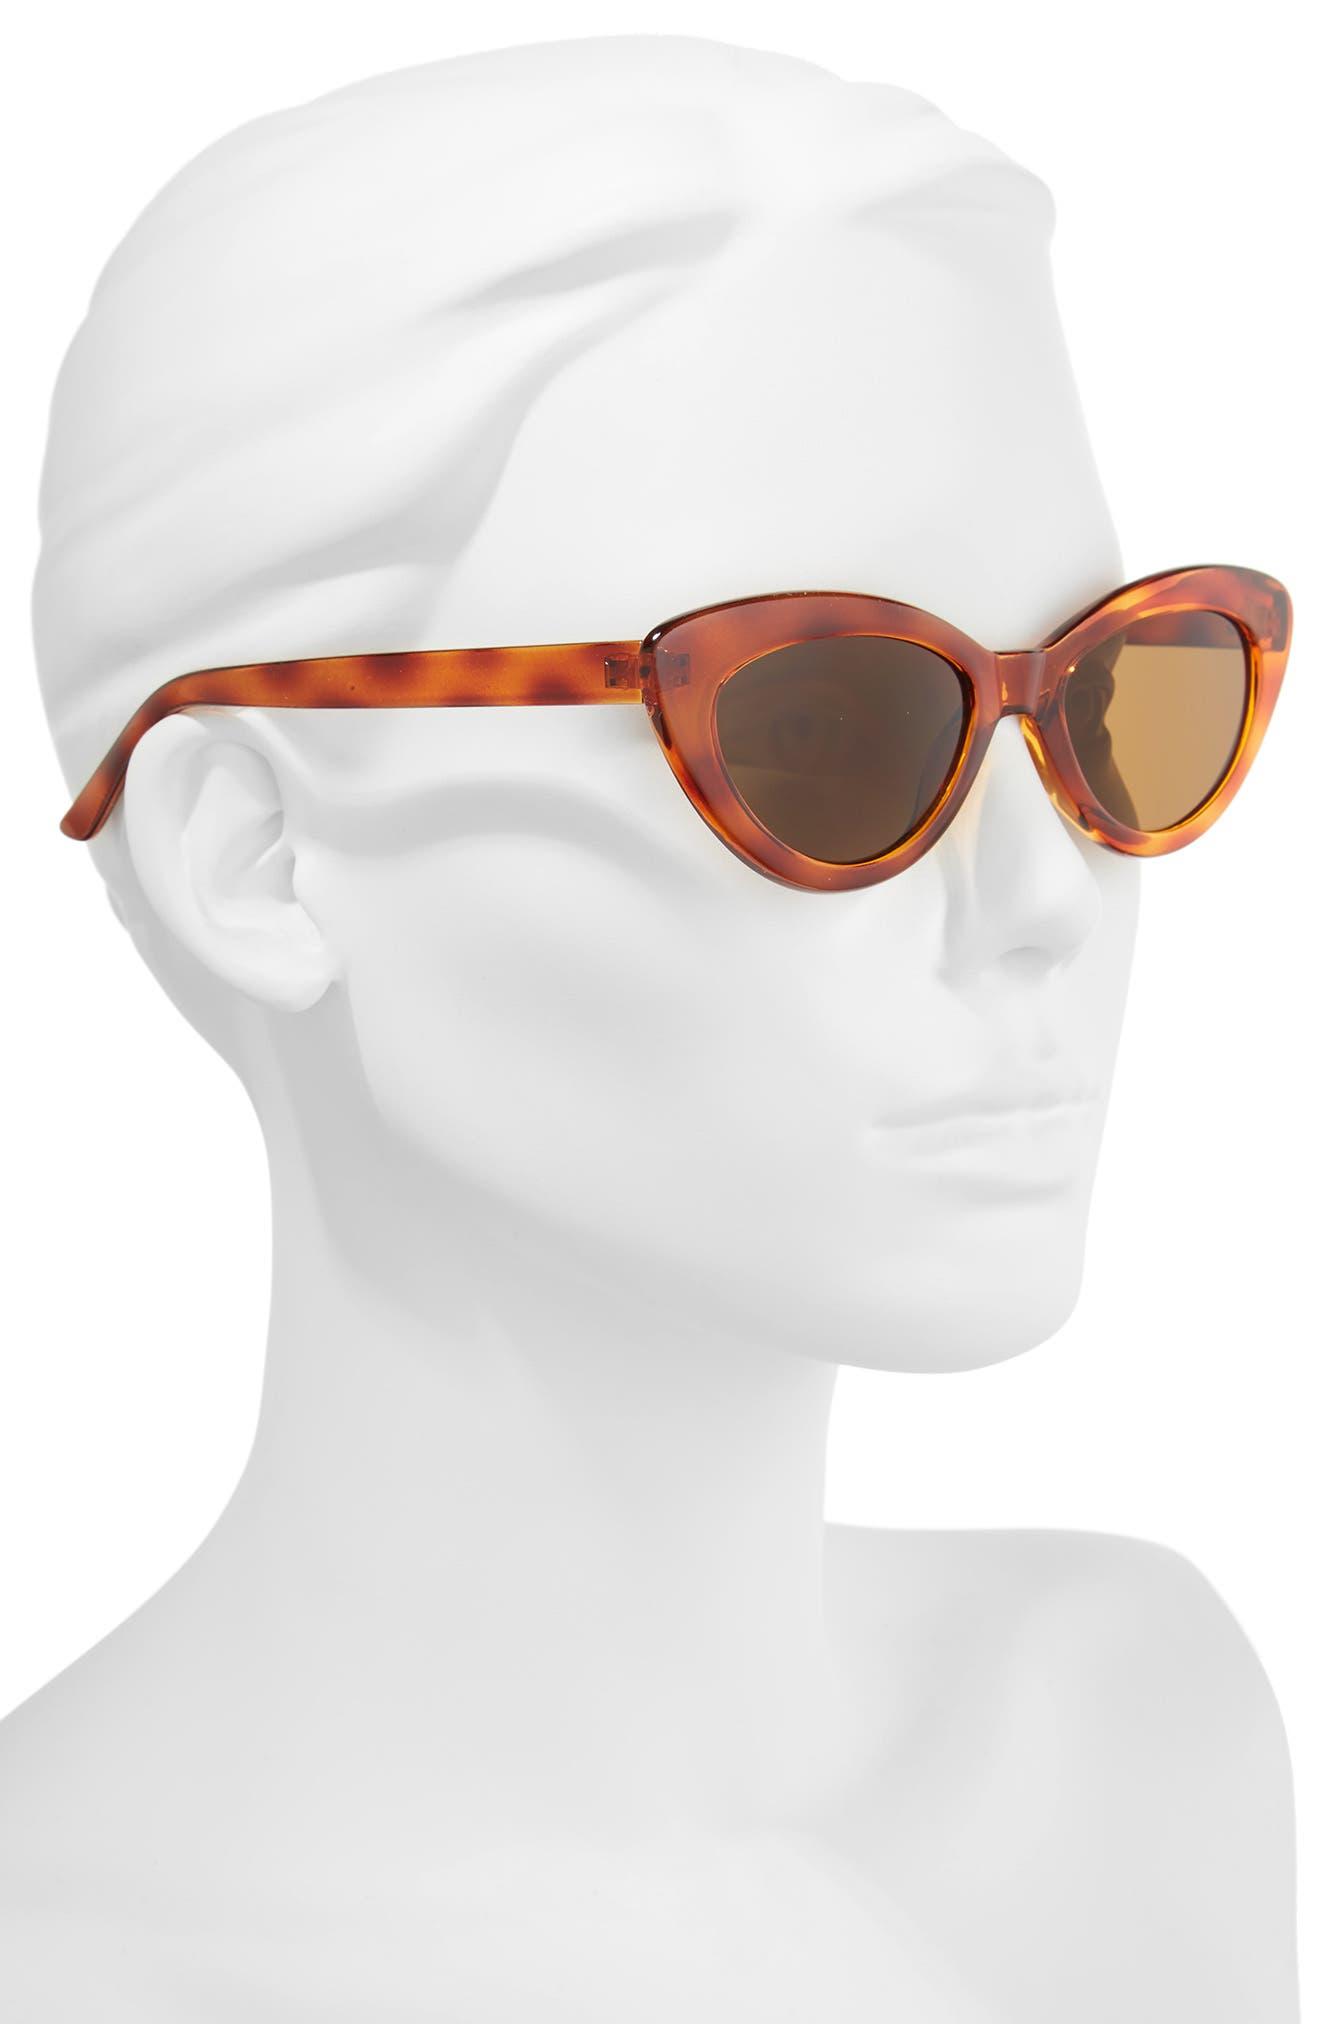 51mm Mini Cat Eye Sunglasses,                             Alternate thumbnail 2, color,                             Tort